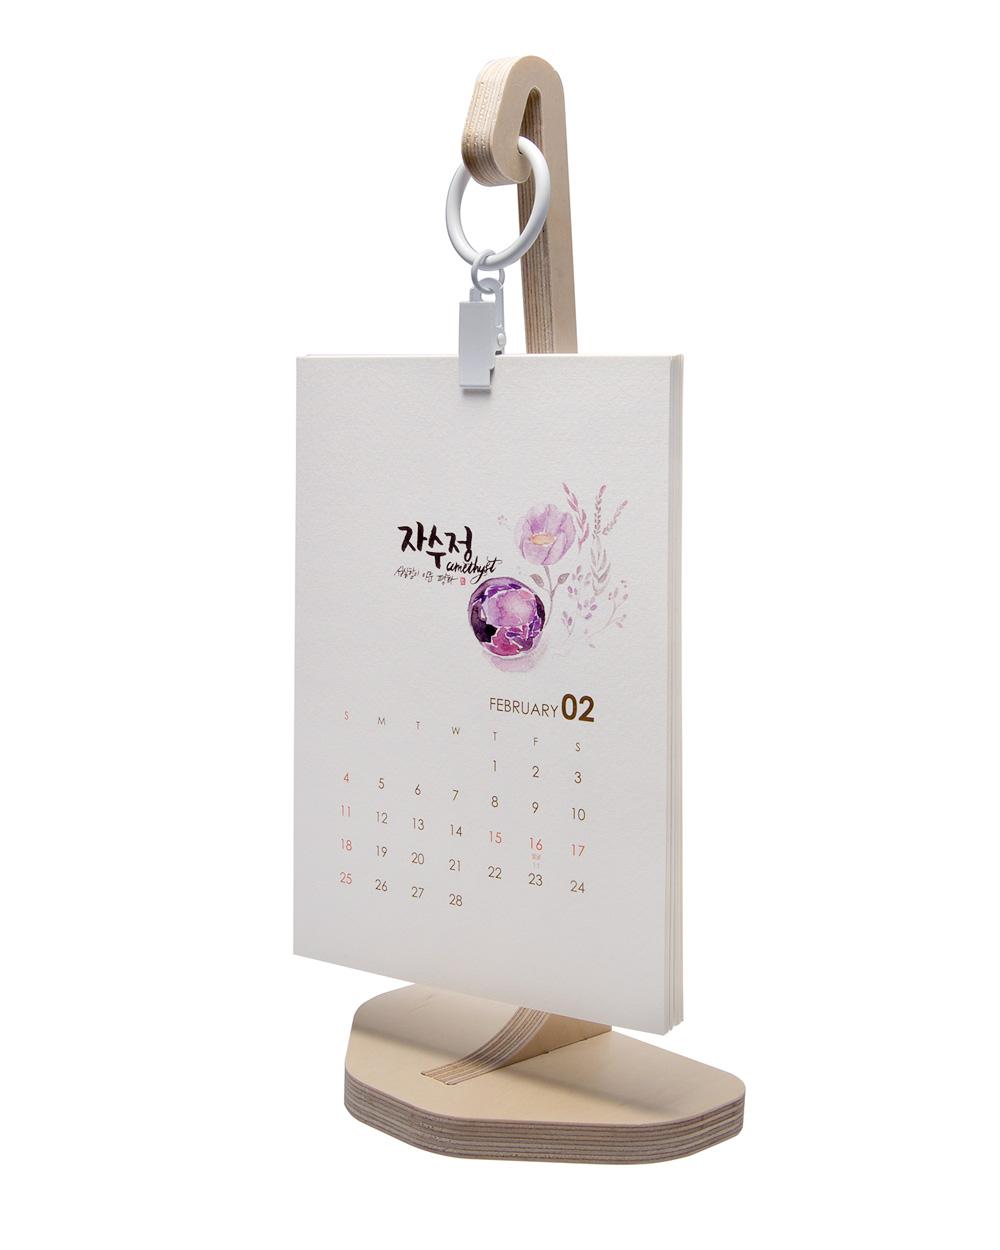 2018 Birthstone Calendar Image